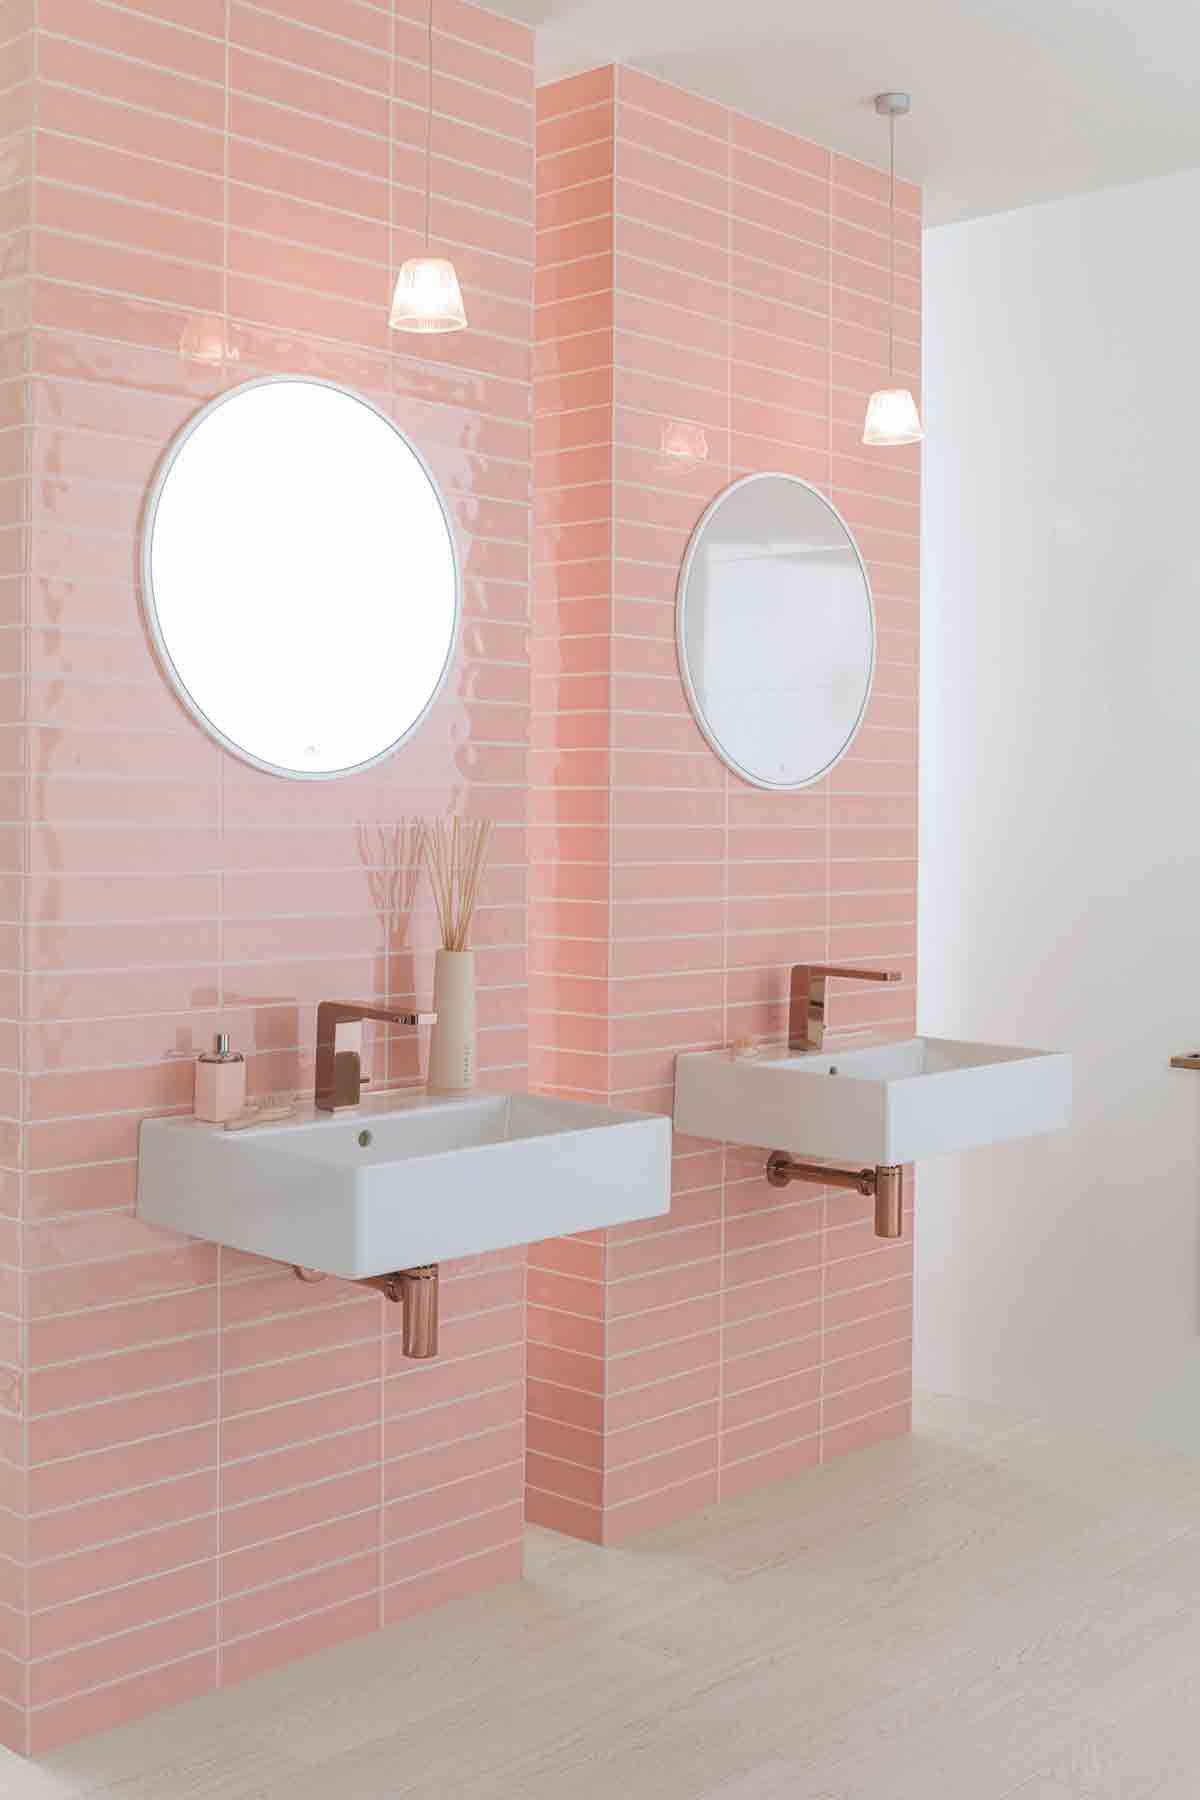 The Latest Bathroom Trends And Bathroom Designs For 2020 Livingetc Livingetcdocument Documenttype